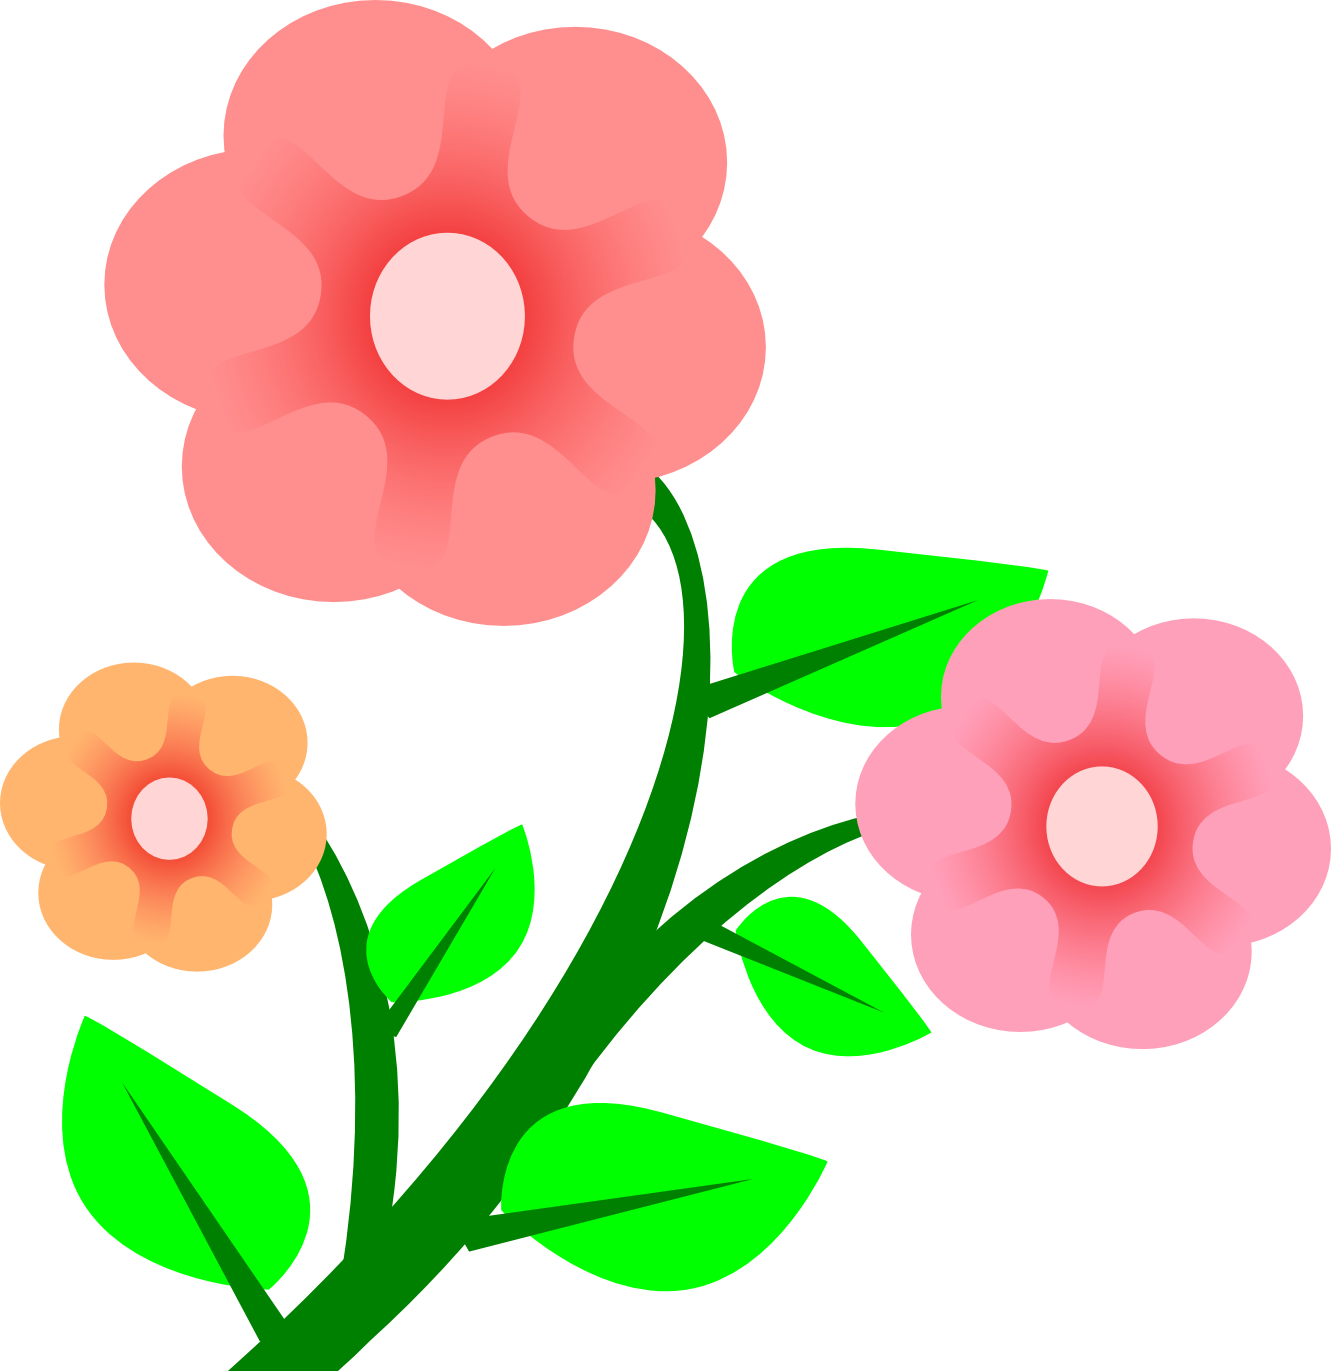 Spring flower clipart free download best spring flower clipart on 1331x1371 clipart pictures flowers mightylinksfo